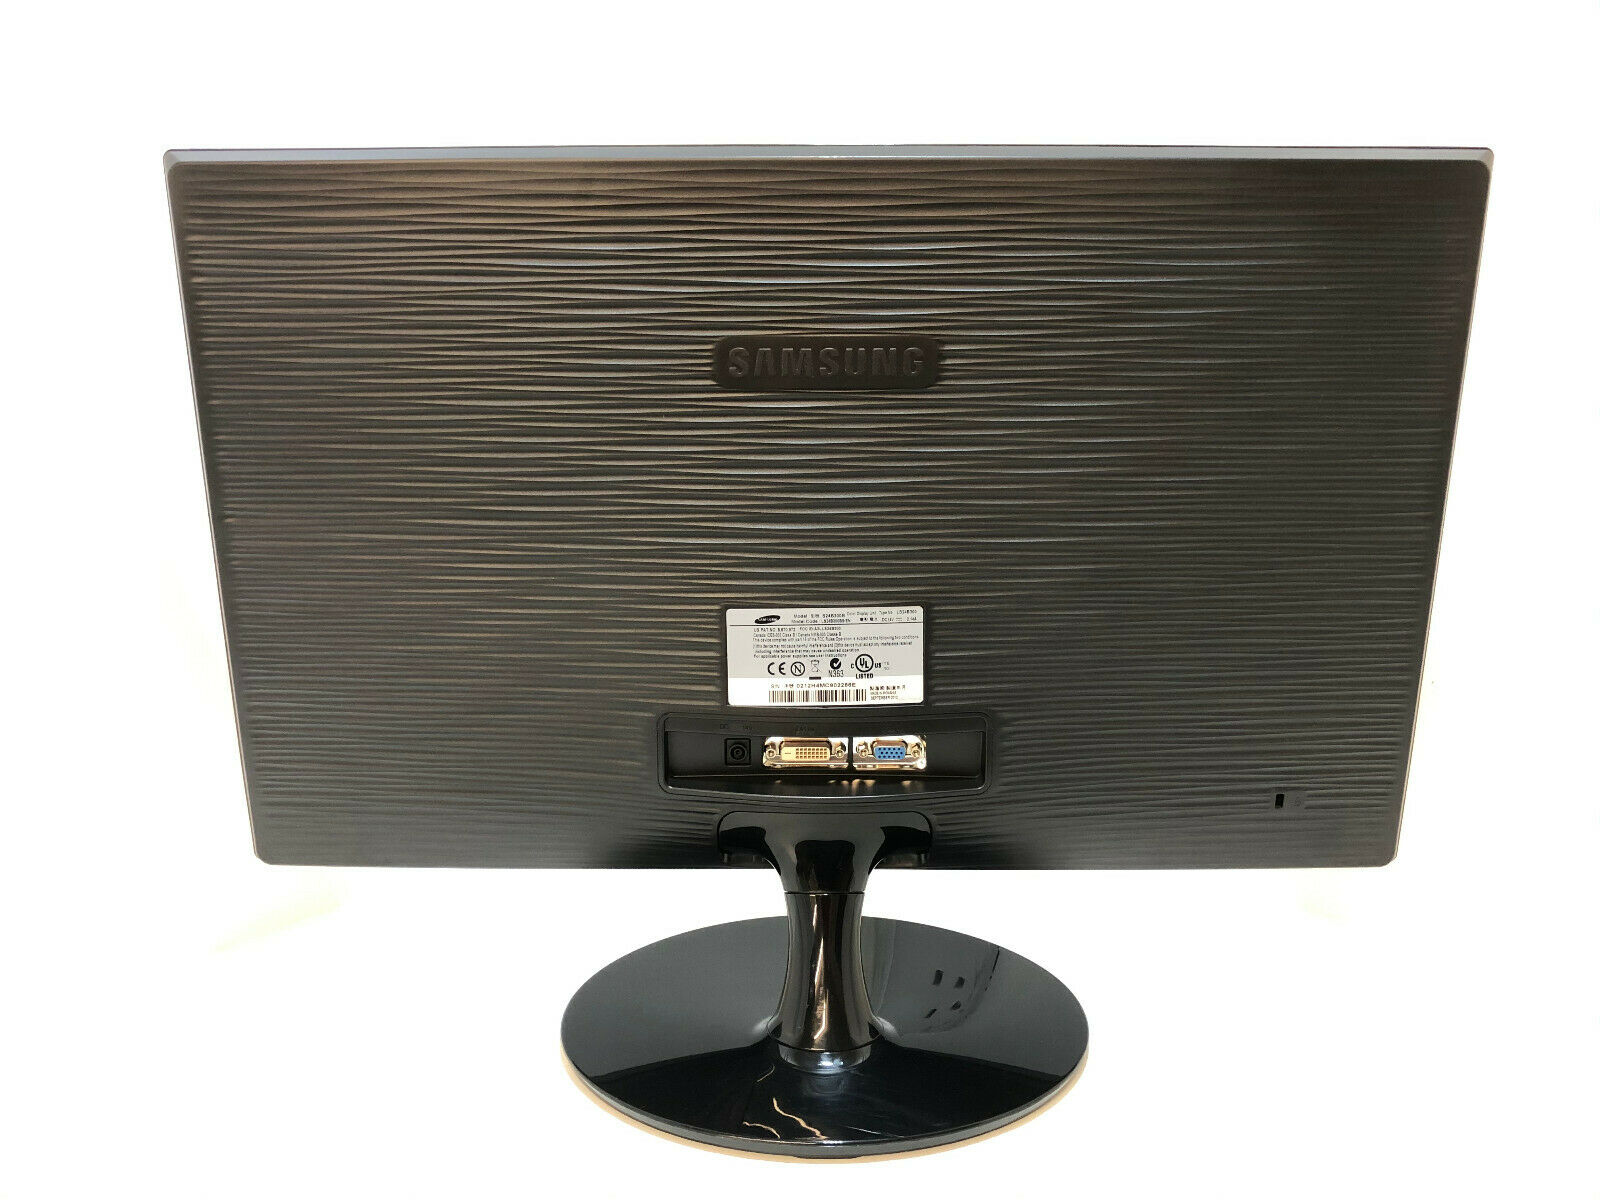 Samsung S24B300 No 4